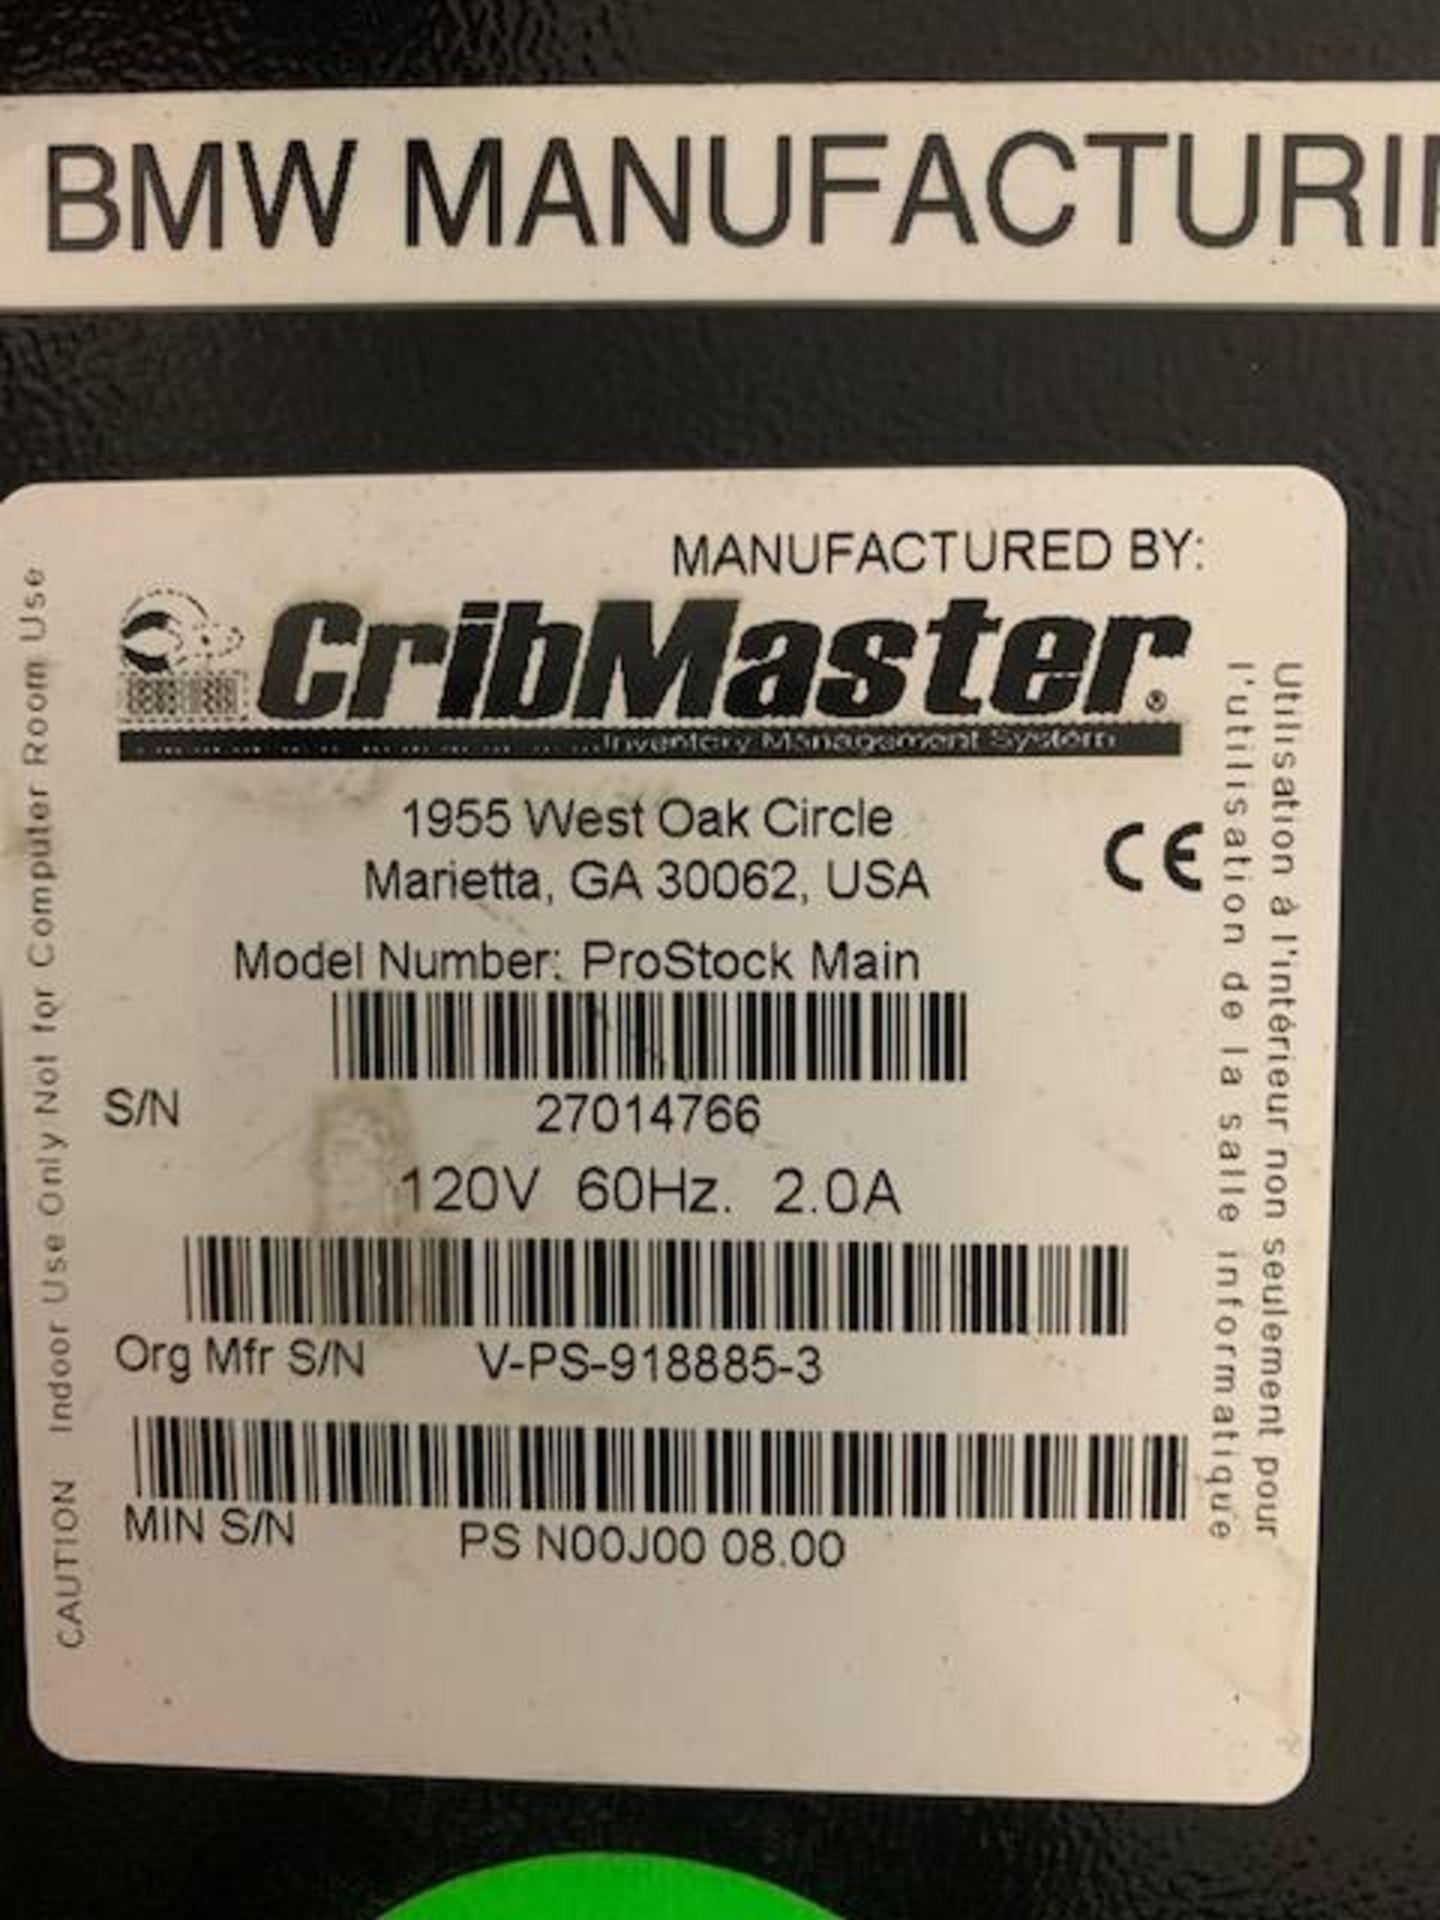 Cribmaster ProStock - Image 9 of 9